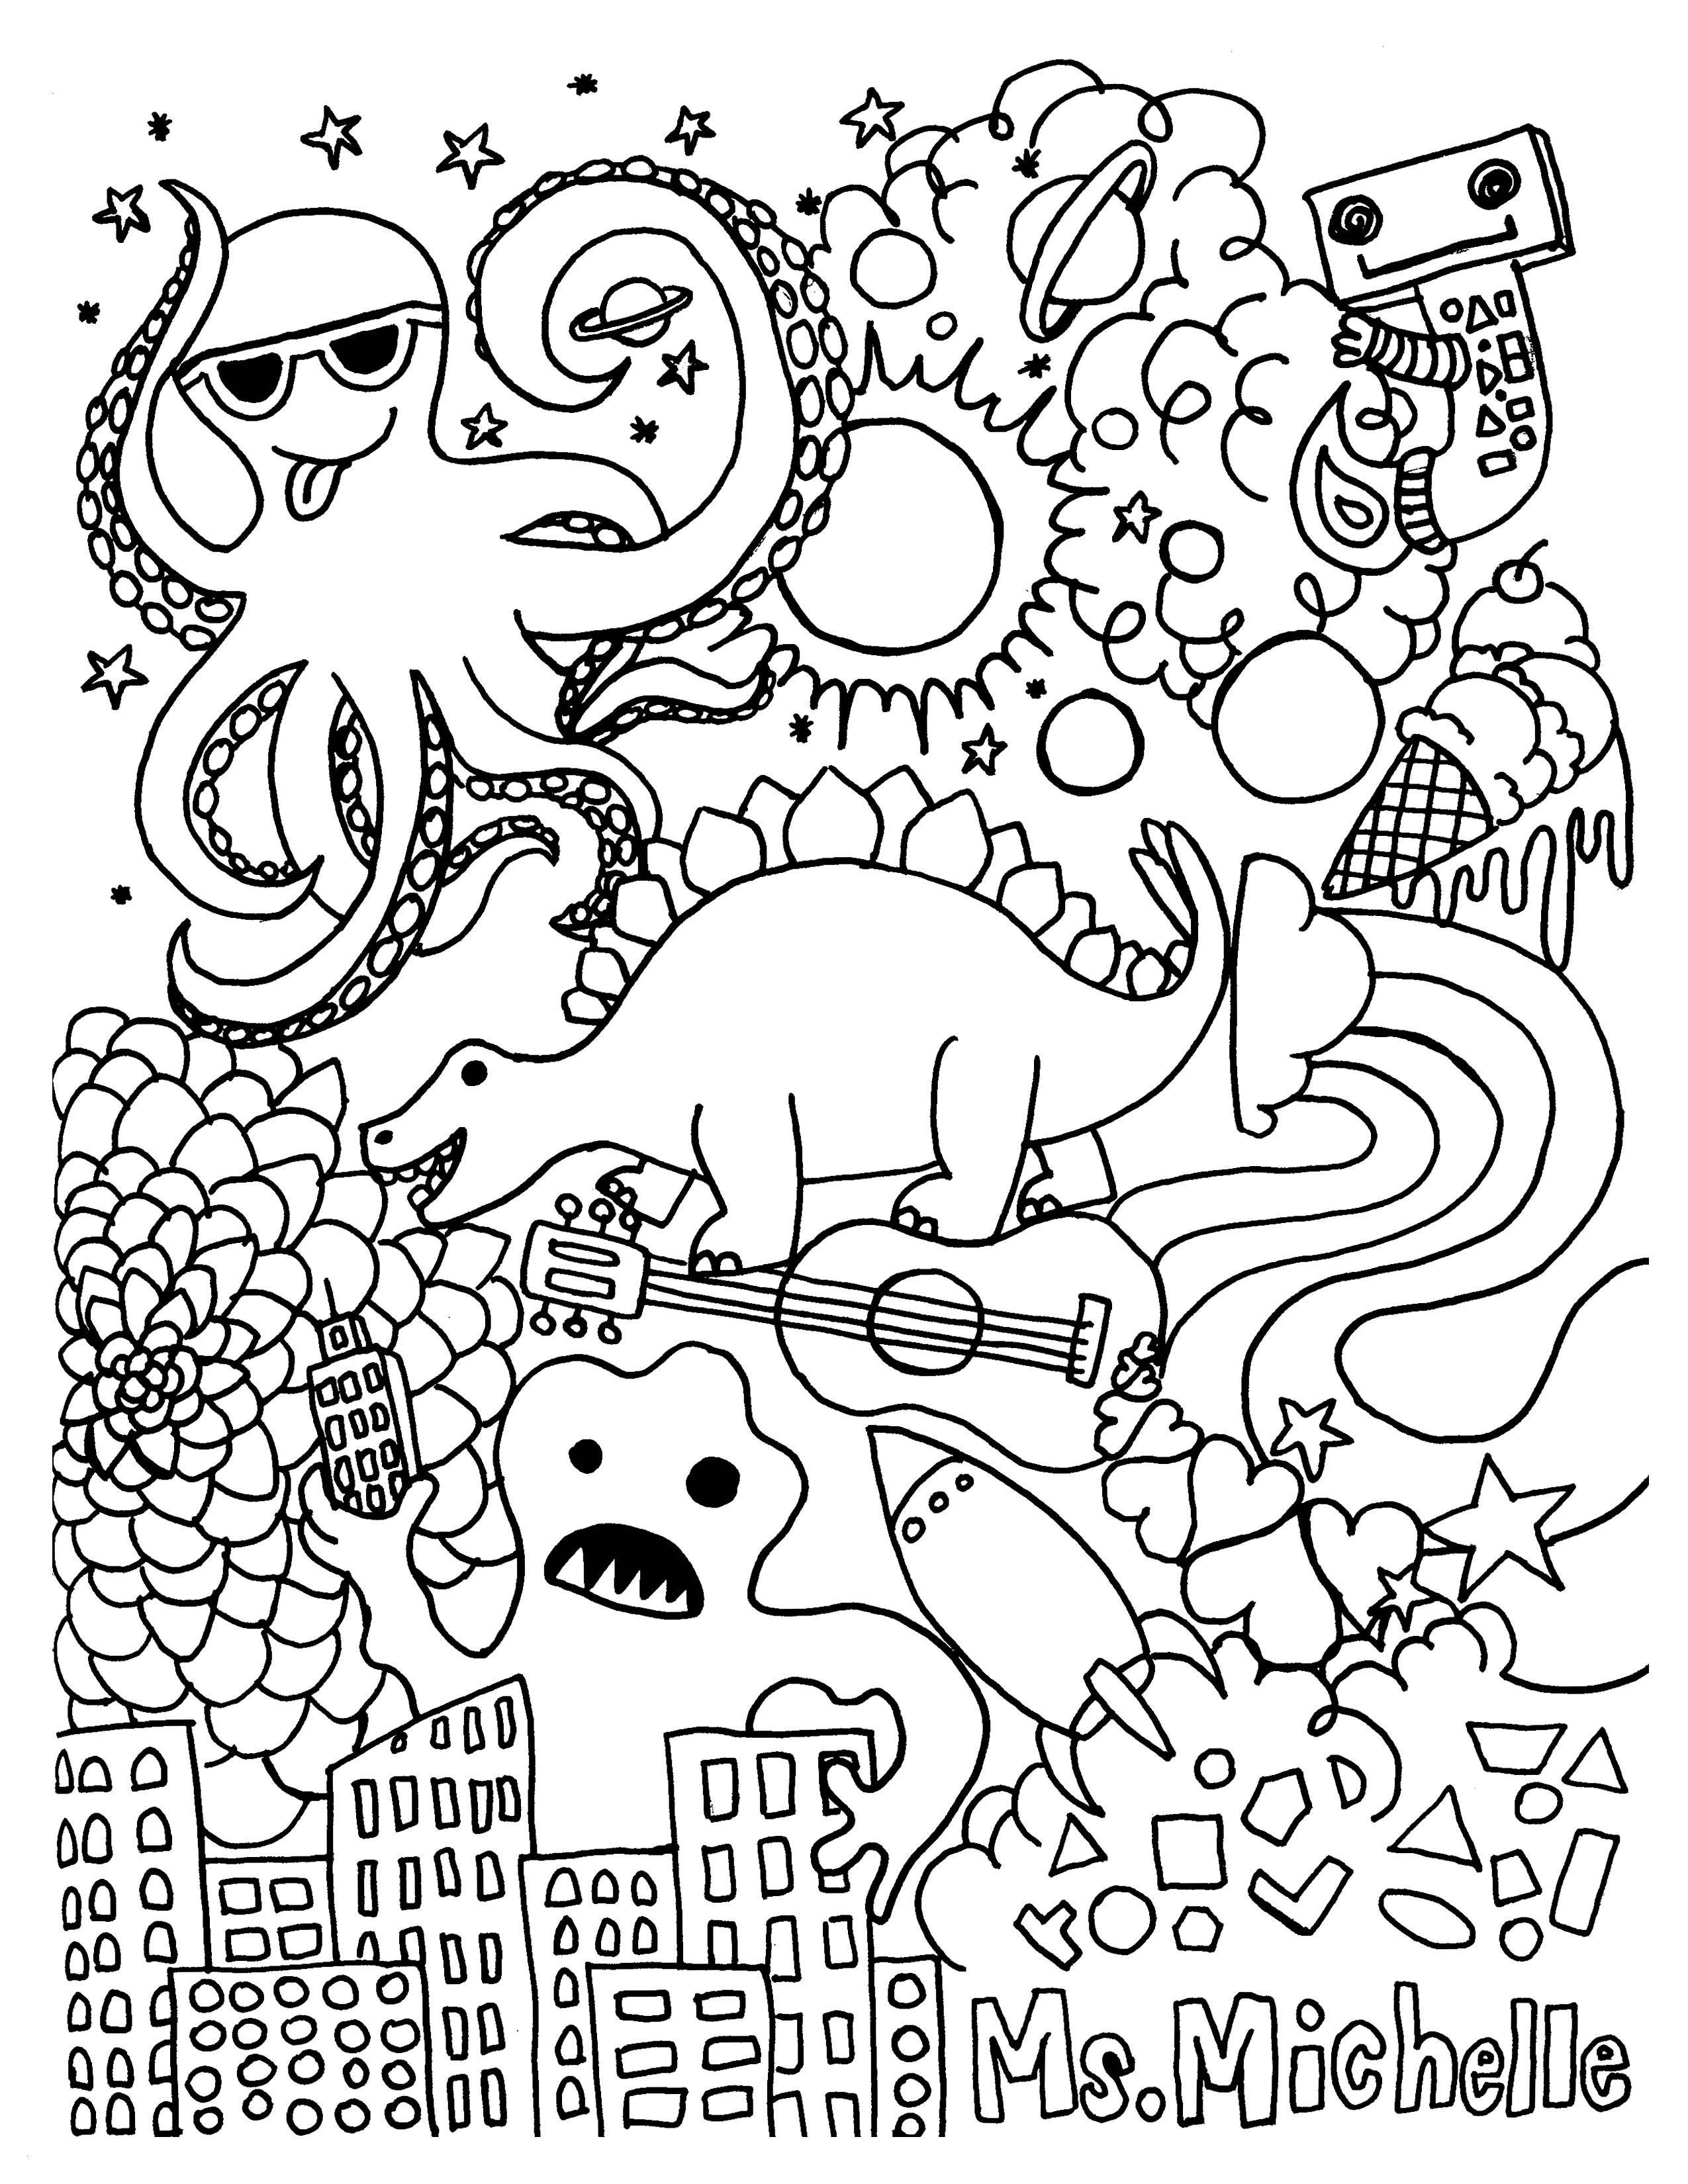 Kung Fu Panda Ausmalbilder Einzigartig Panda Coloring Sheets New 1st Grade Coloring Pages Printable Bild